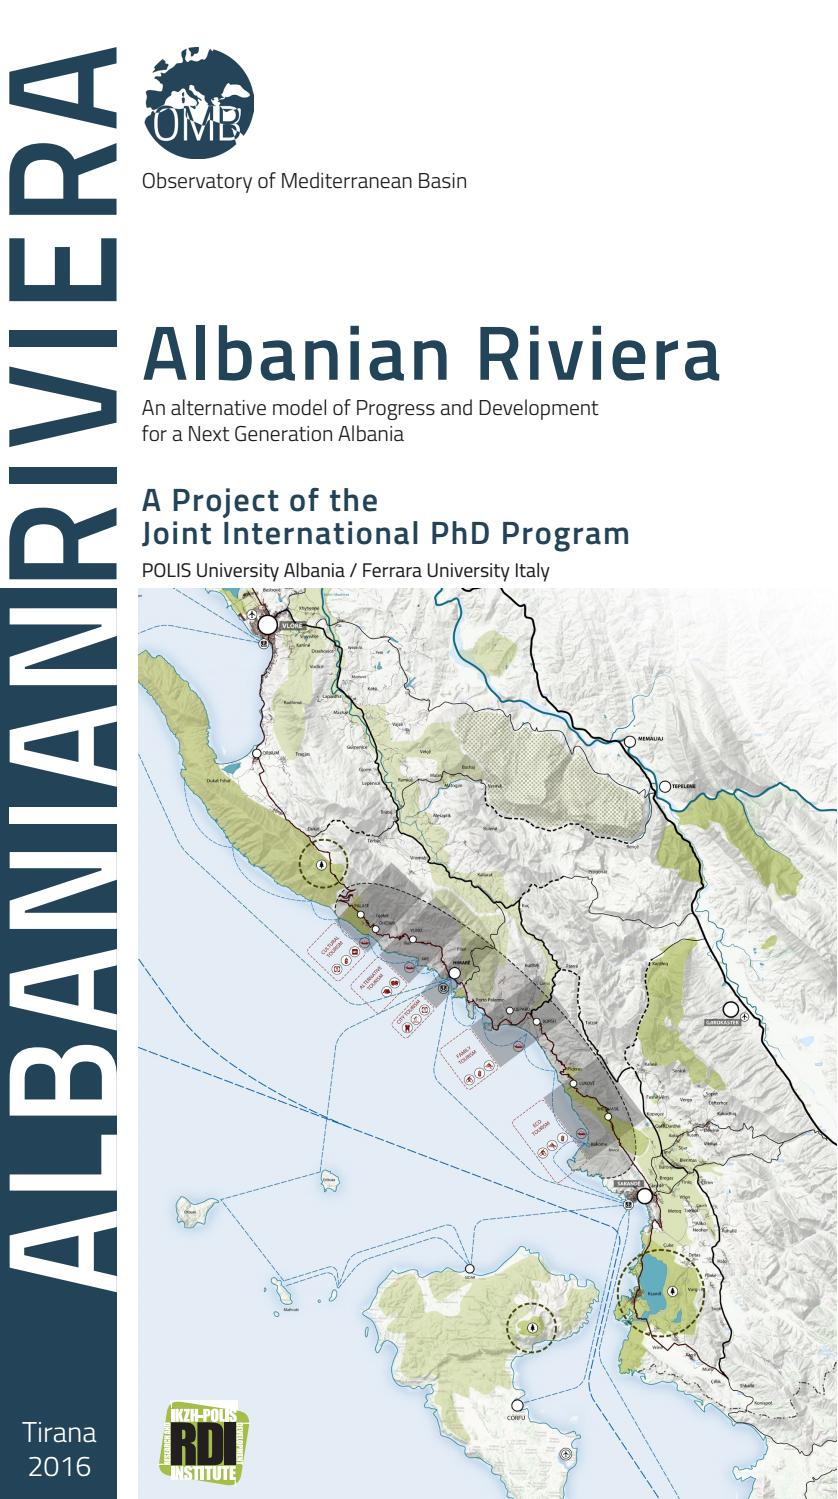 Observatory of Mediterranean Basin  Albanian Riviera by enrico